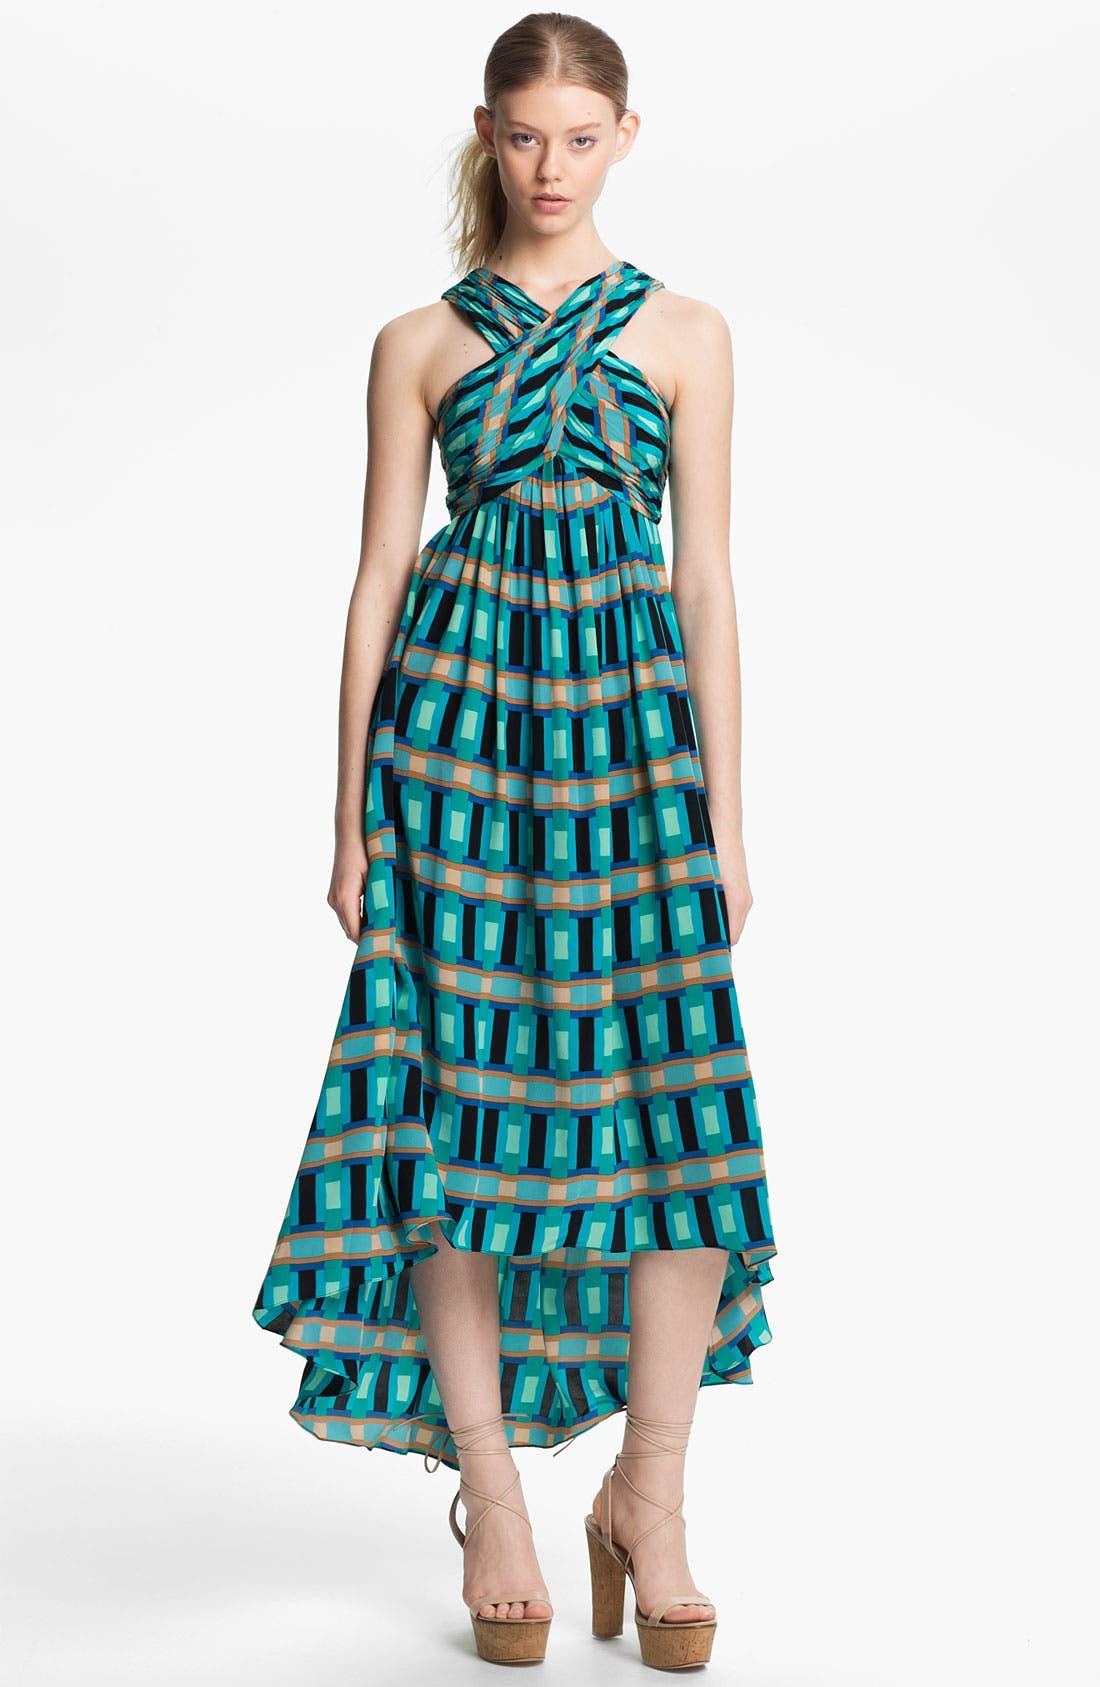 Alternate Image 1 Selected - Tracy Reese 'Bright Blocks' Silk Halter Dress